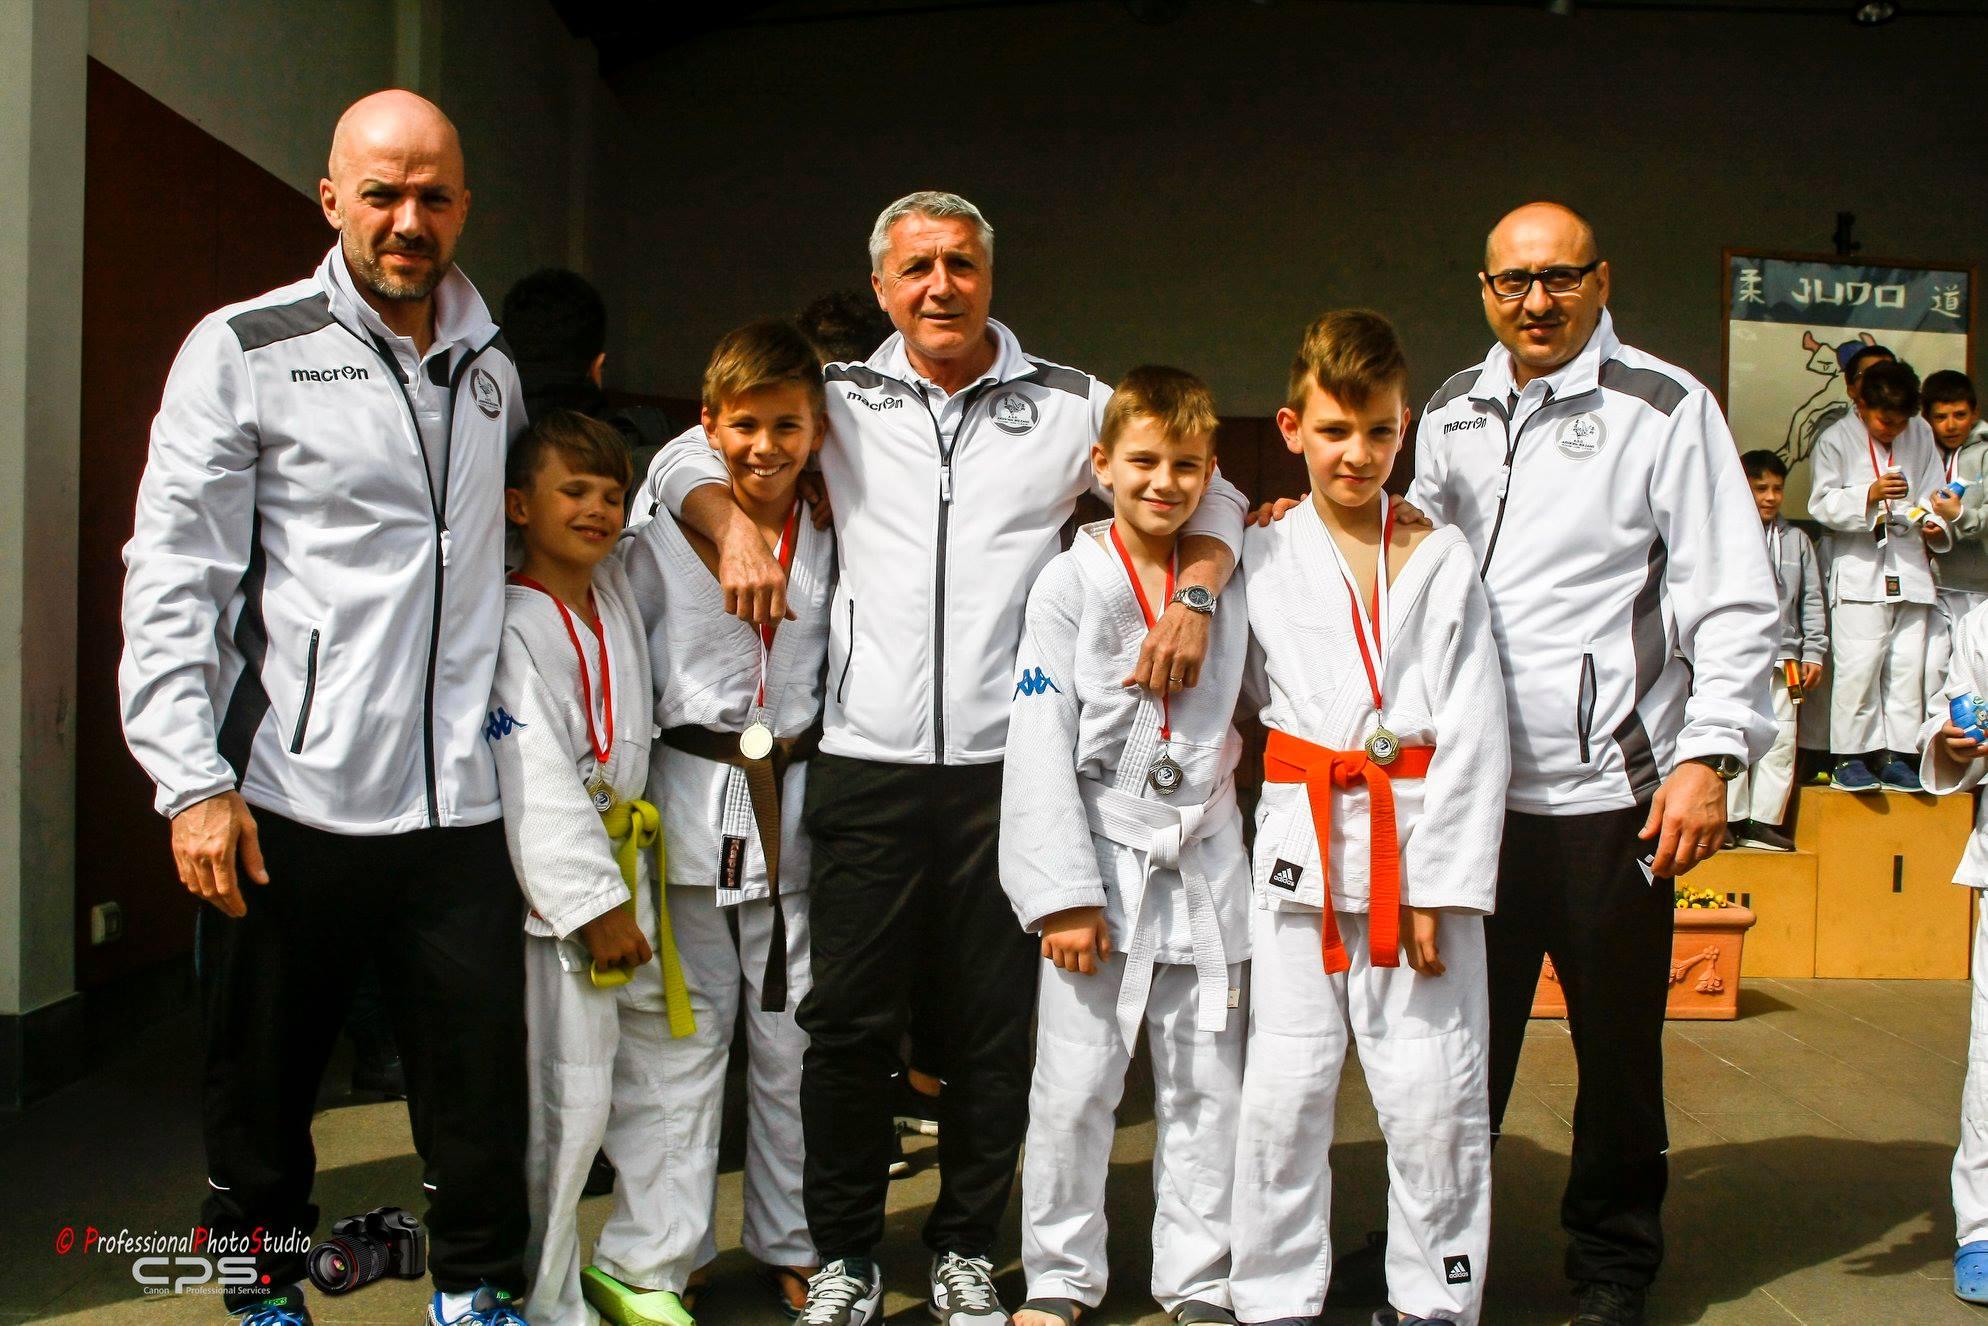 A.S.D. Judokwai Bolzano   2° Trofeo Judo FIJLKAM Libertas   Rodengo 2019